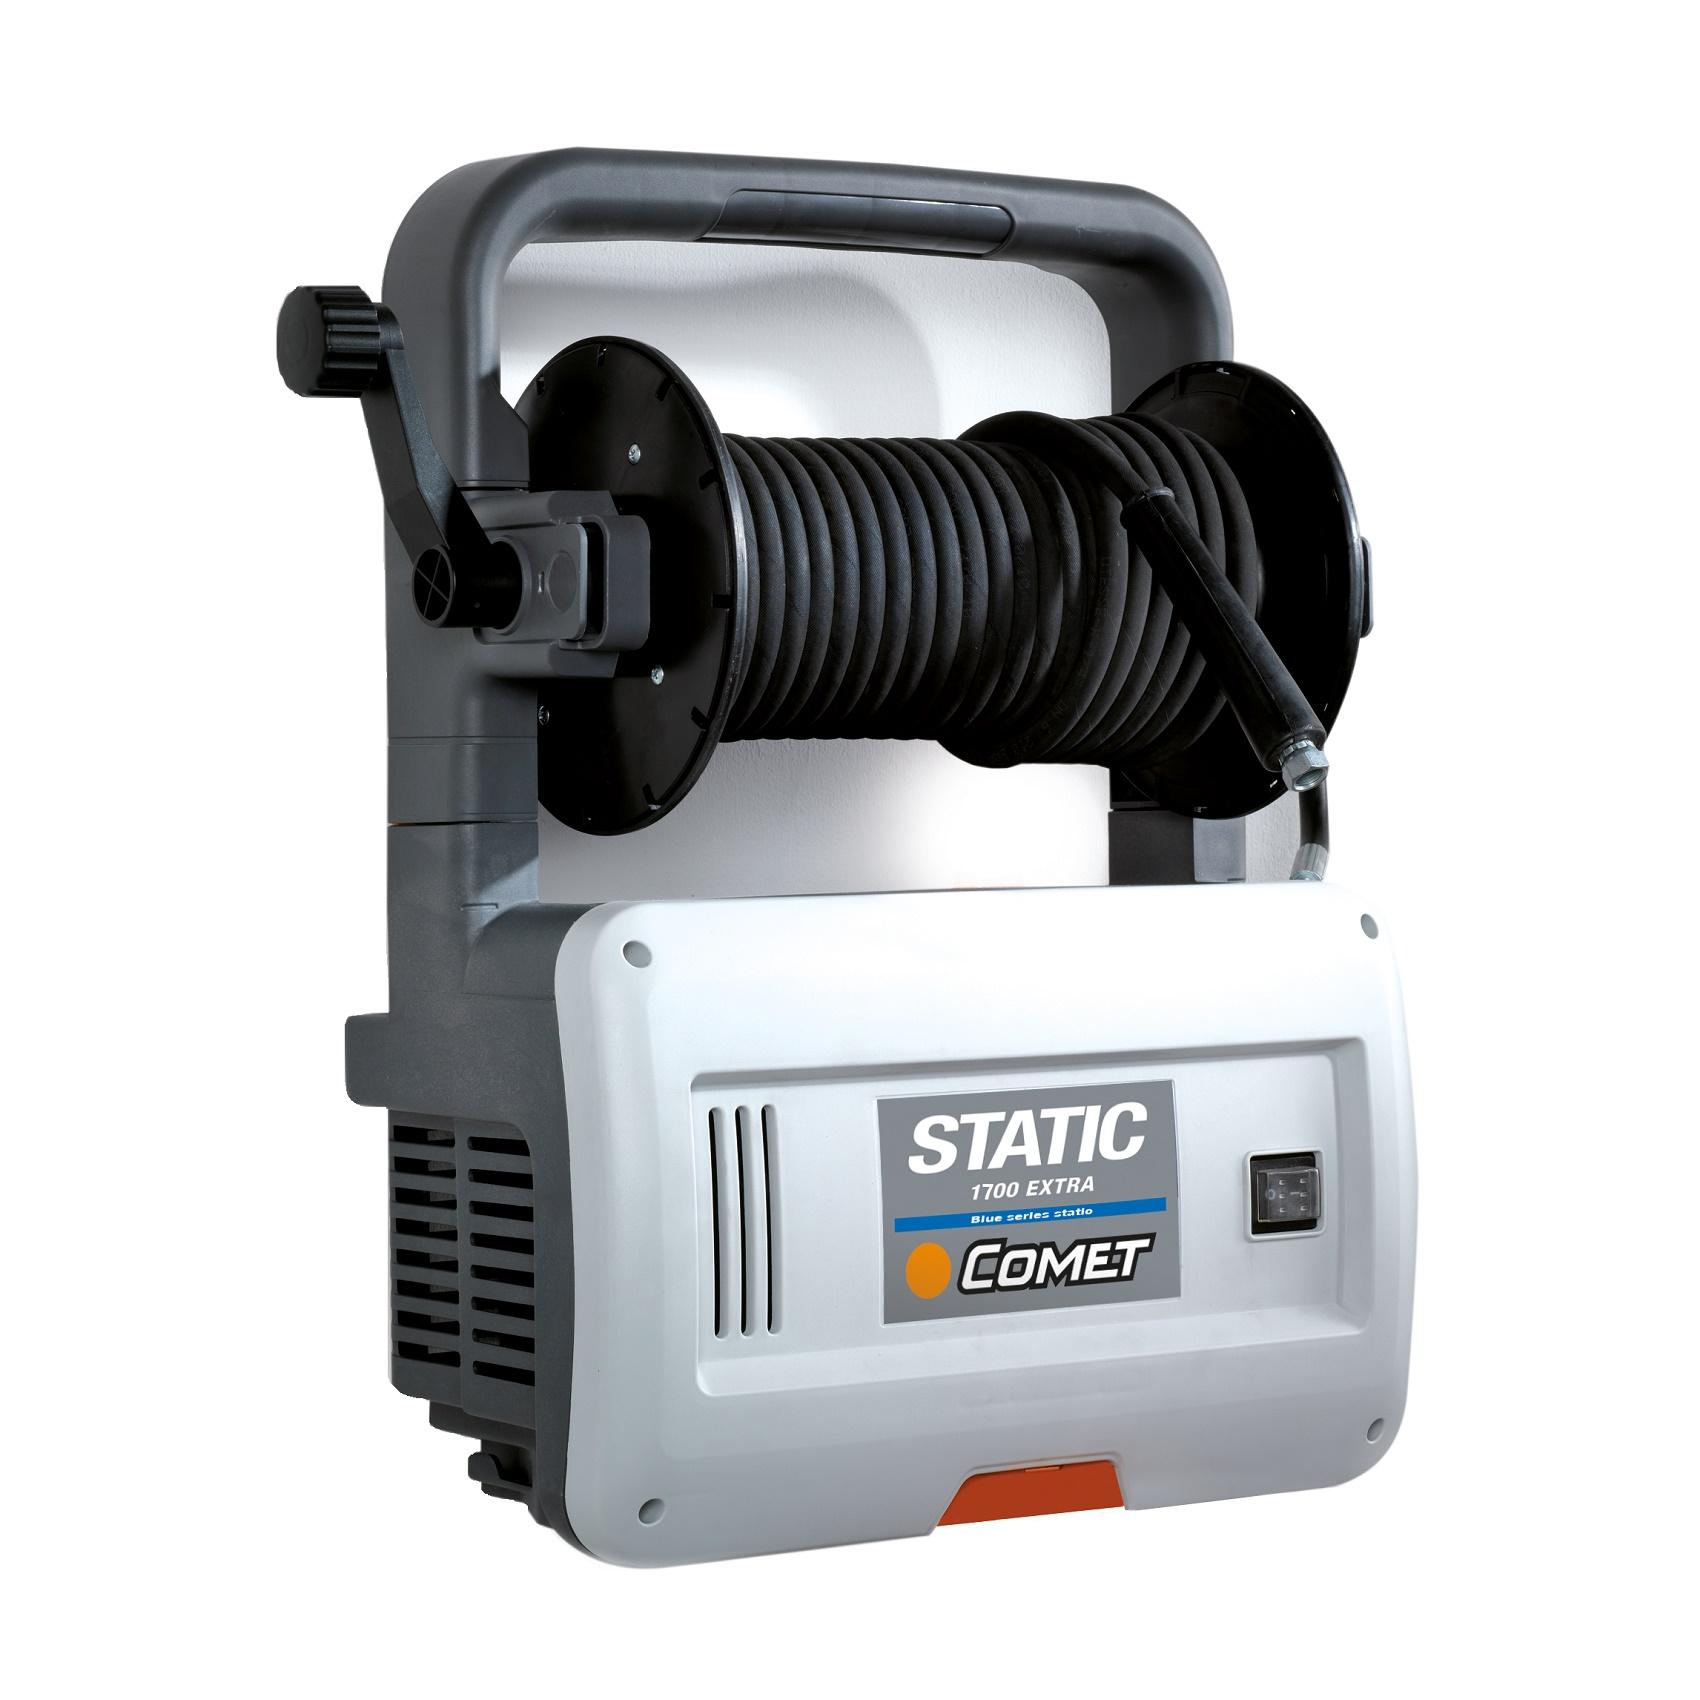 کارواش کومت مدل STATIC 1700 CLASSIC GOLD